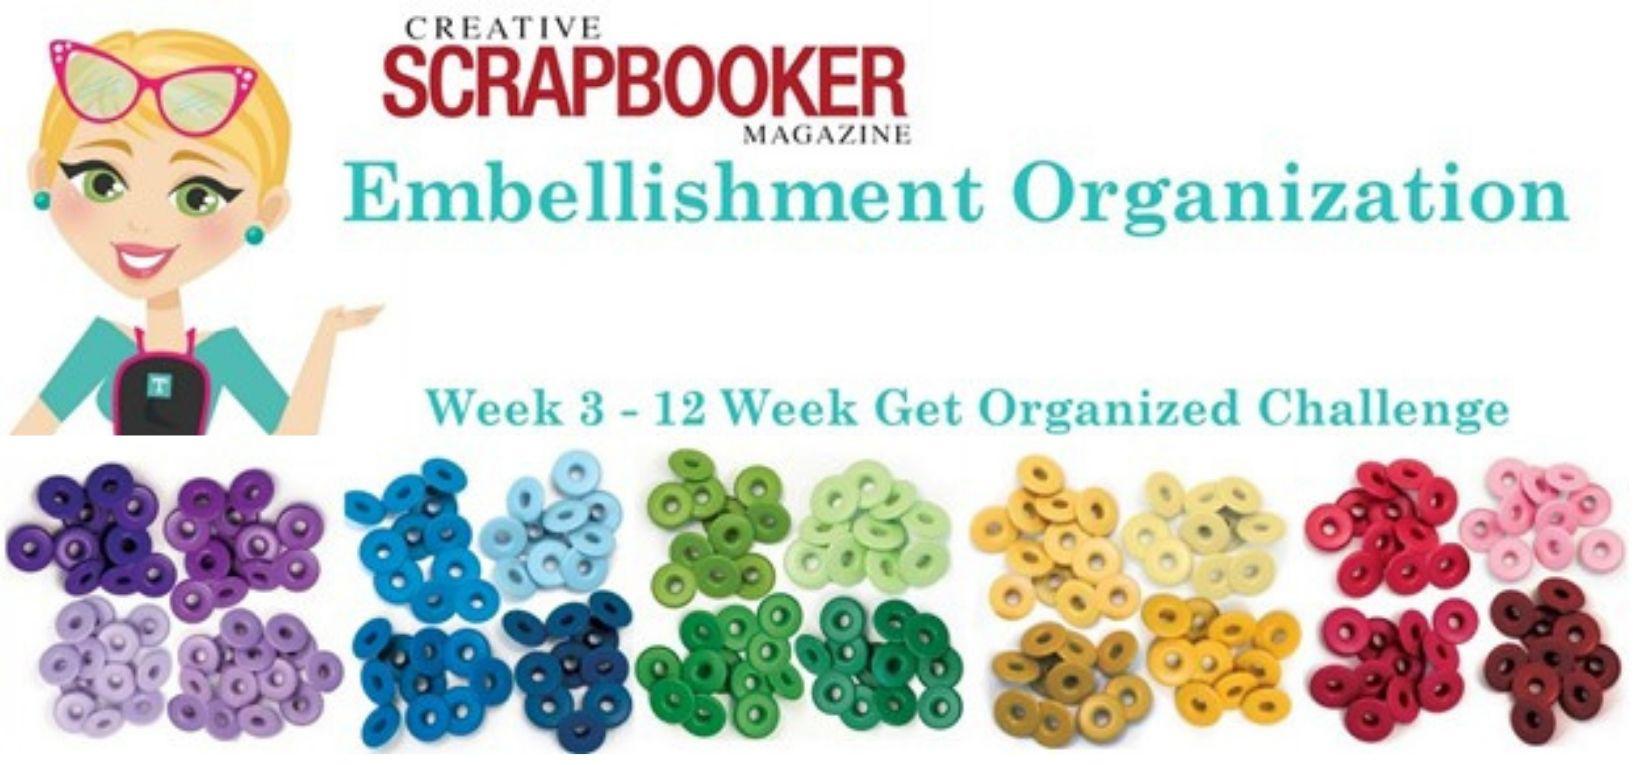 Week #3 - Embellishment Organization